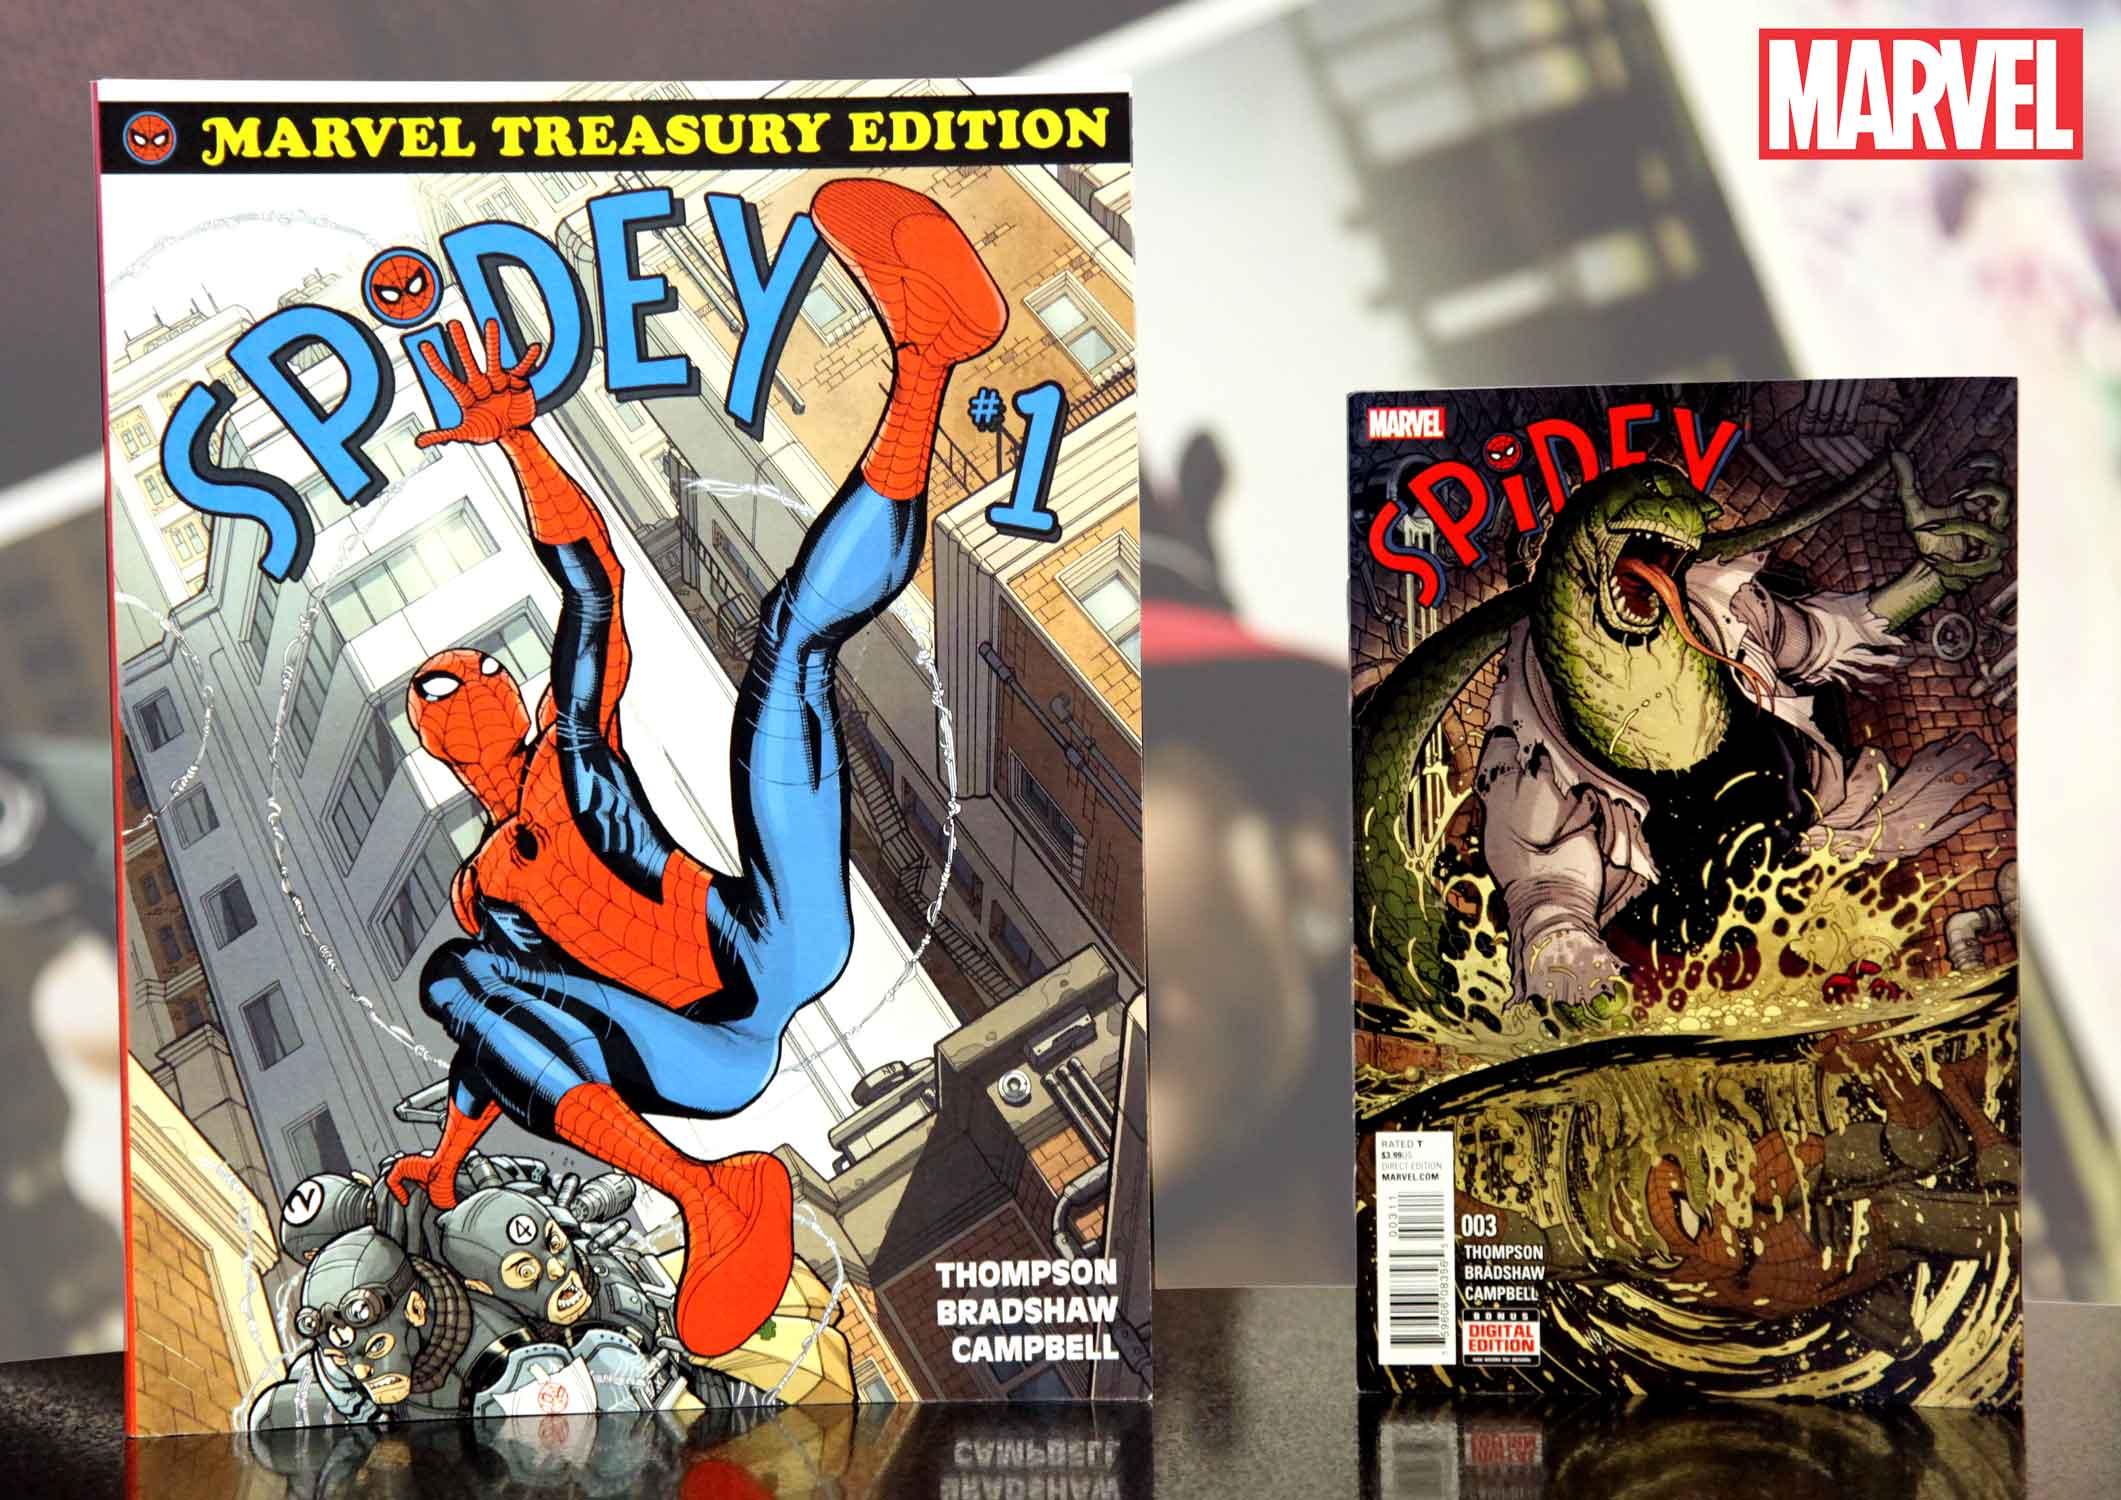 Spidey: All-New Treasury Edition Vol. 1